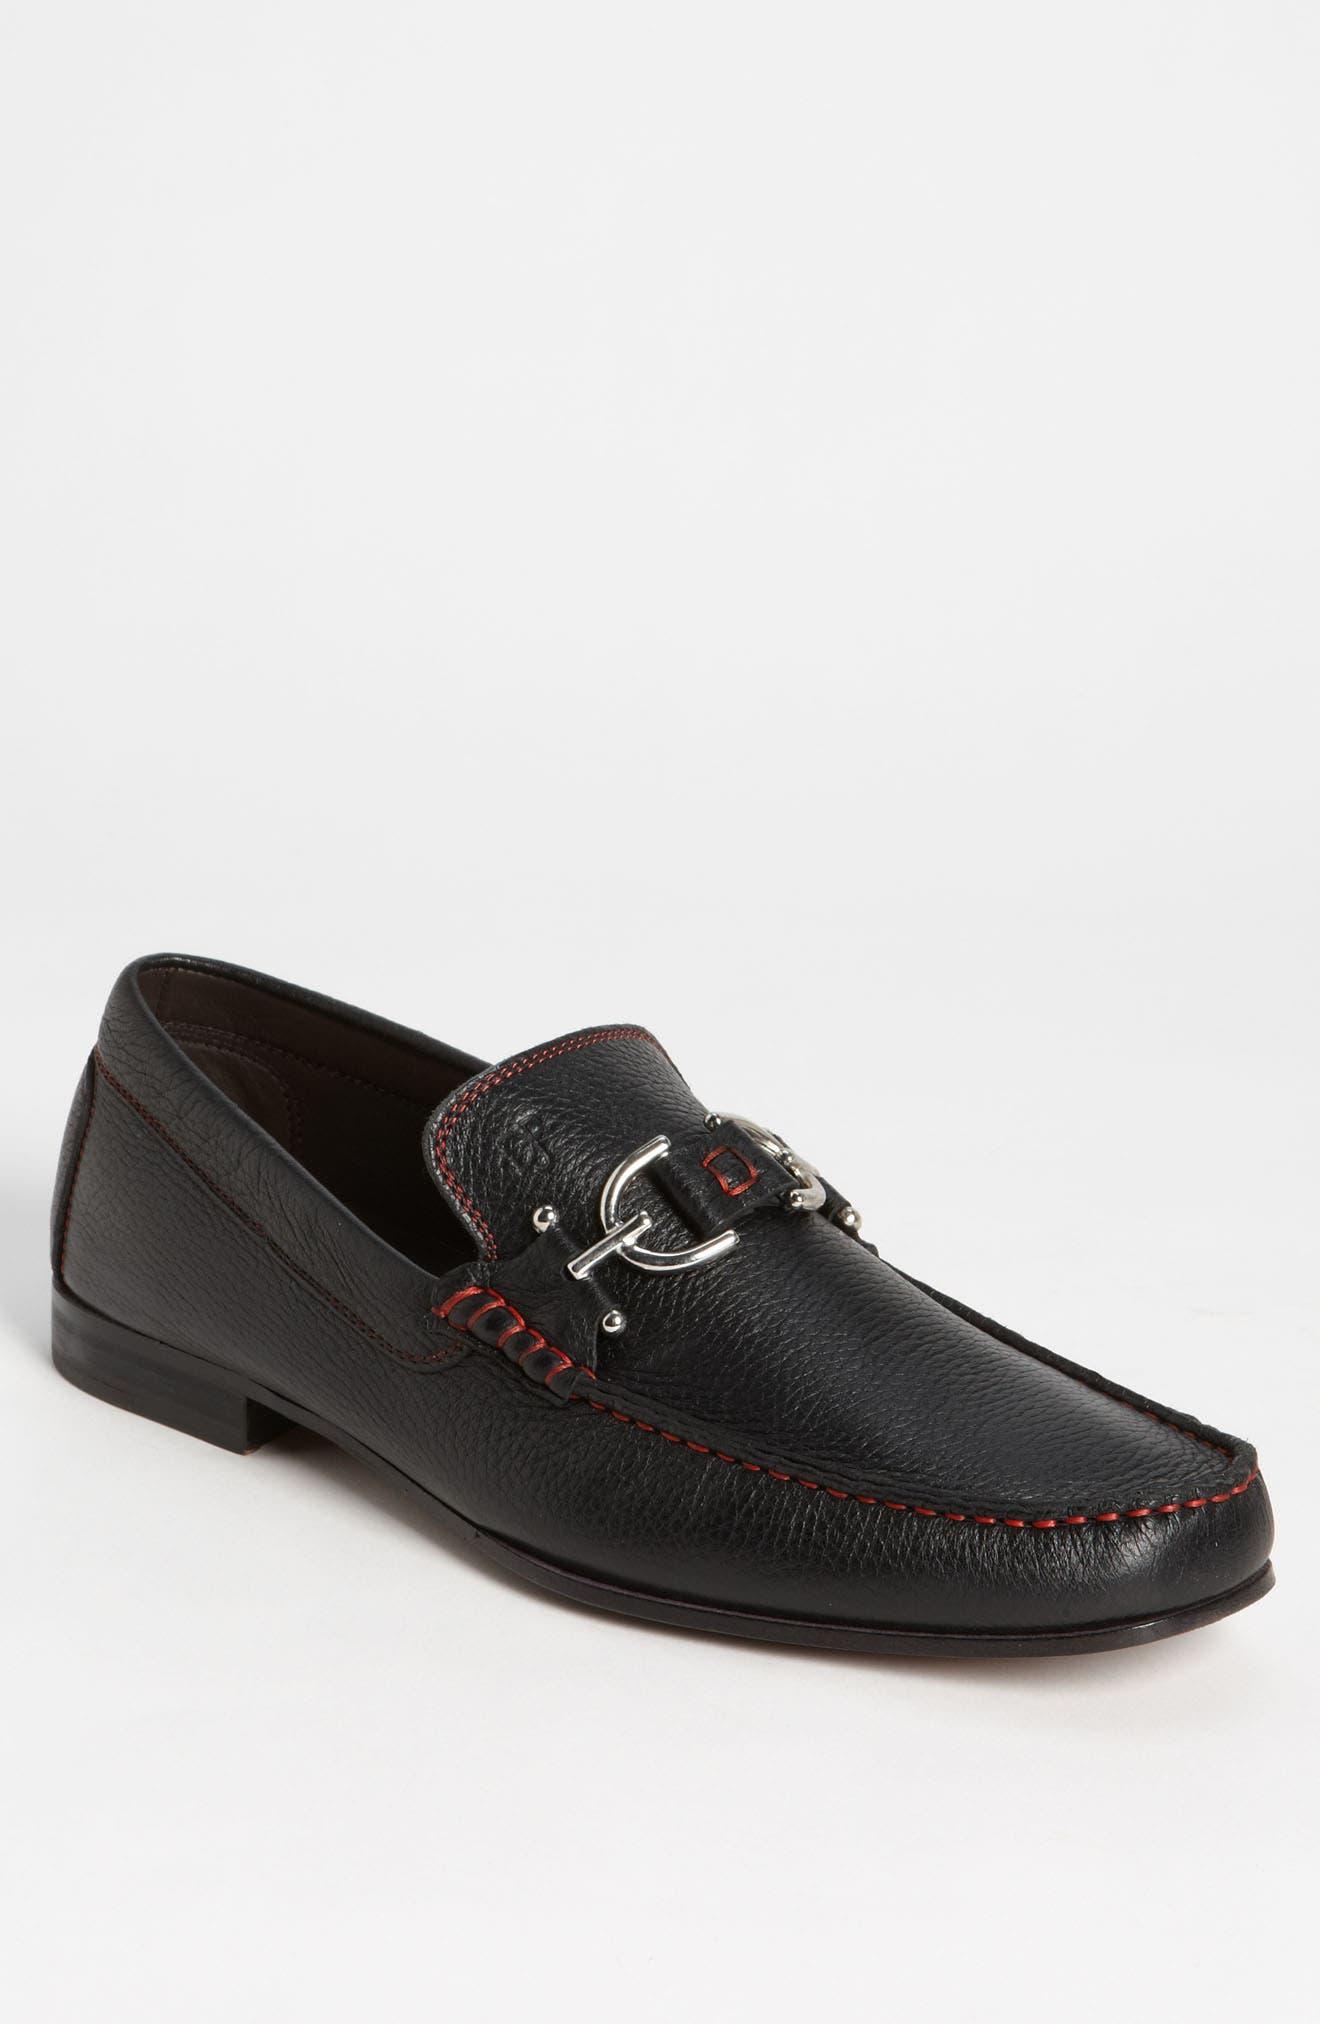 Dacio II Loafer,                         Main,                         color, 002